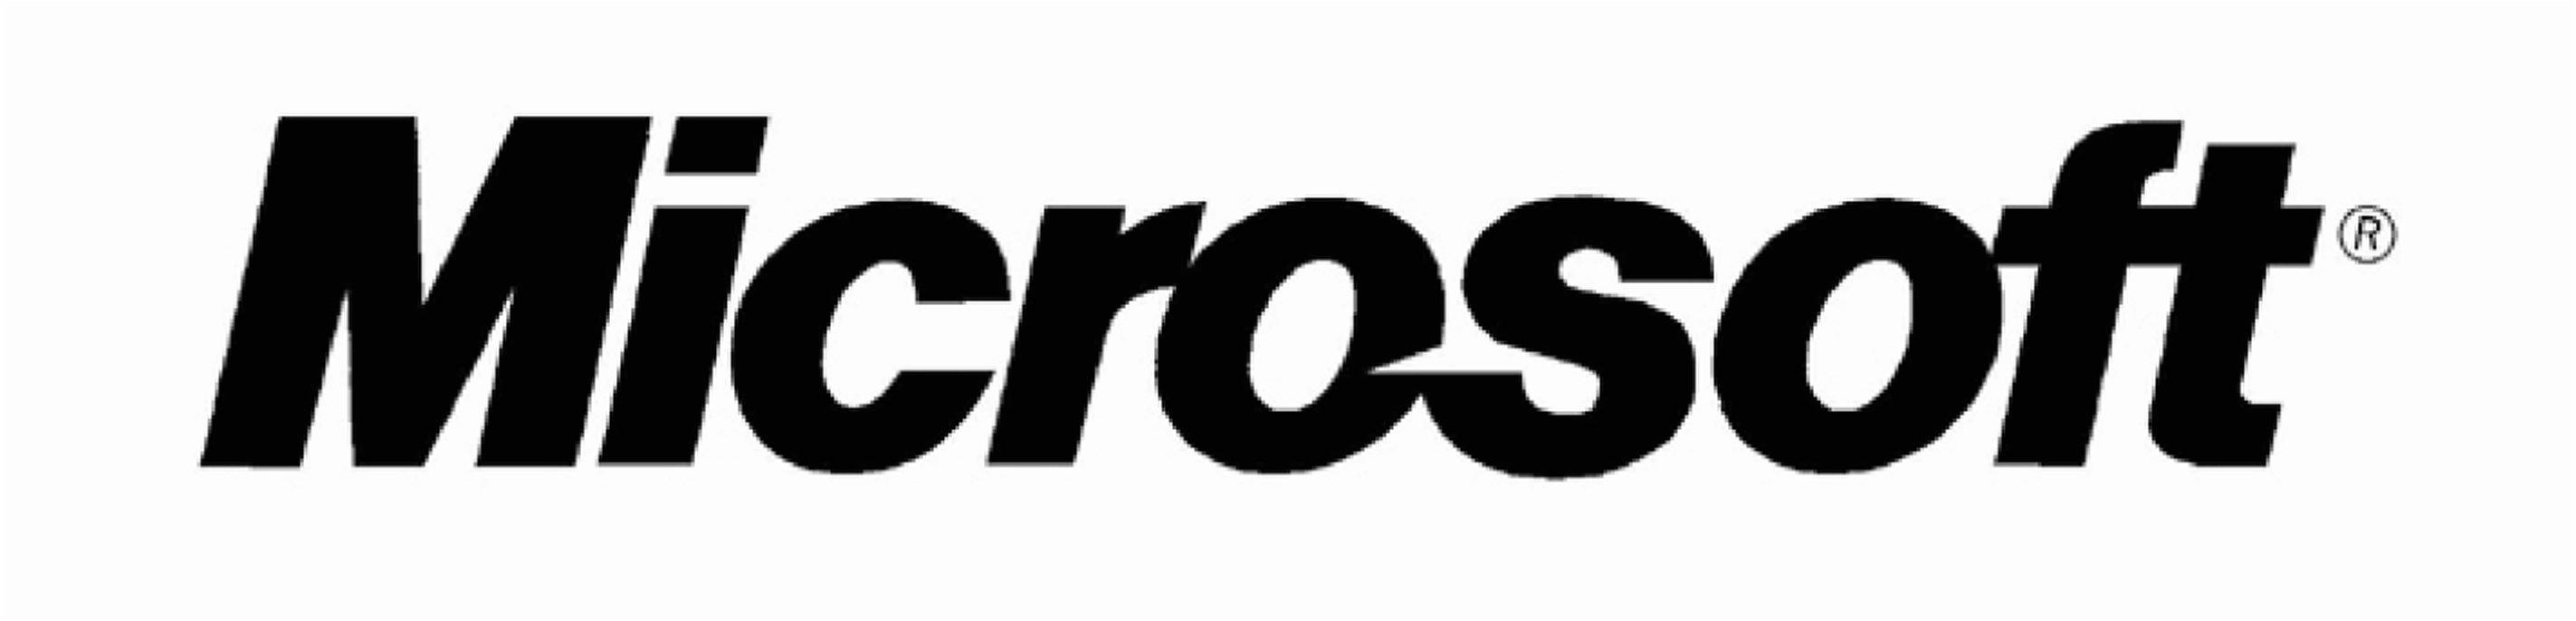 Surface-Tablets von Microsoft offenbar ohne 3G/4G-microsoft-logo.jpg